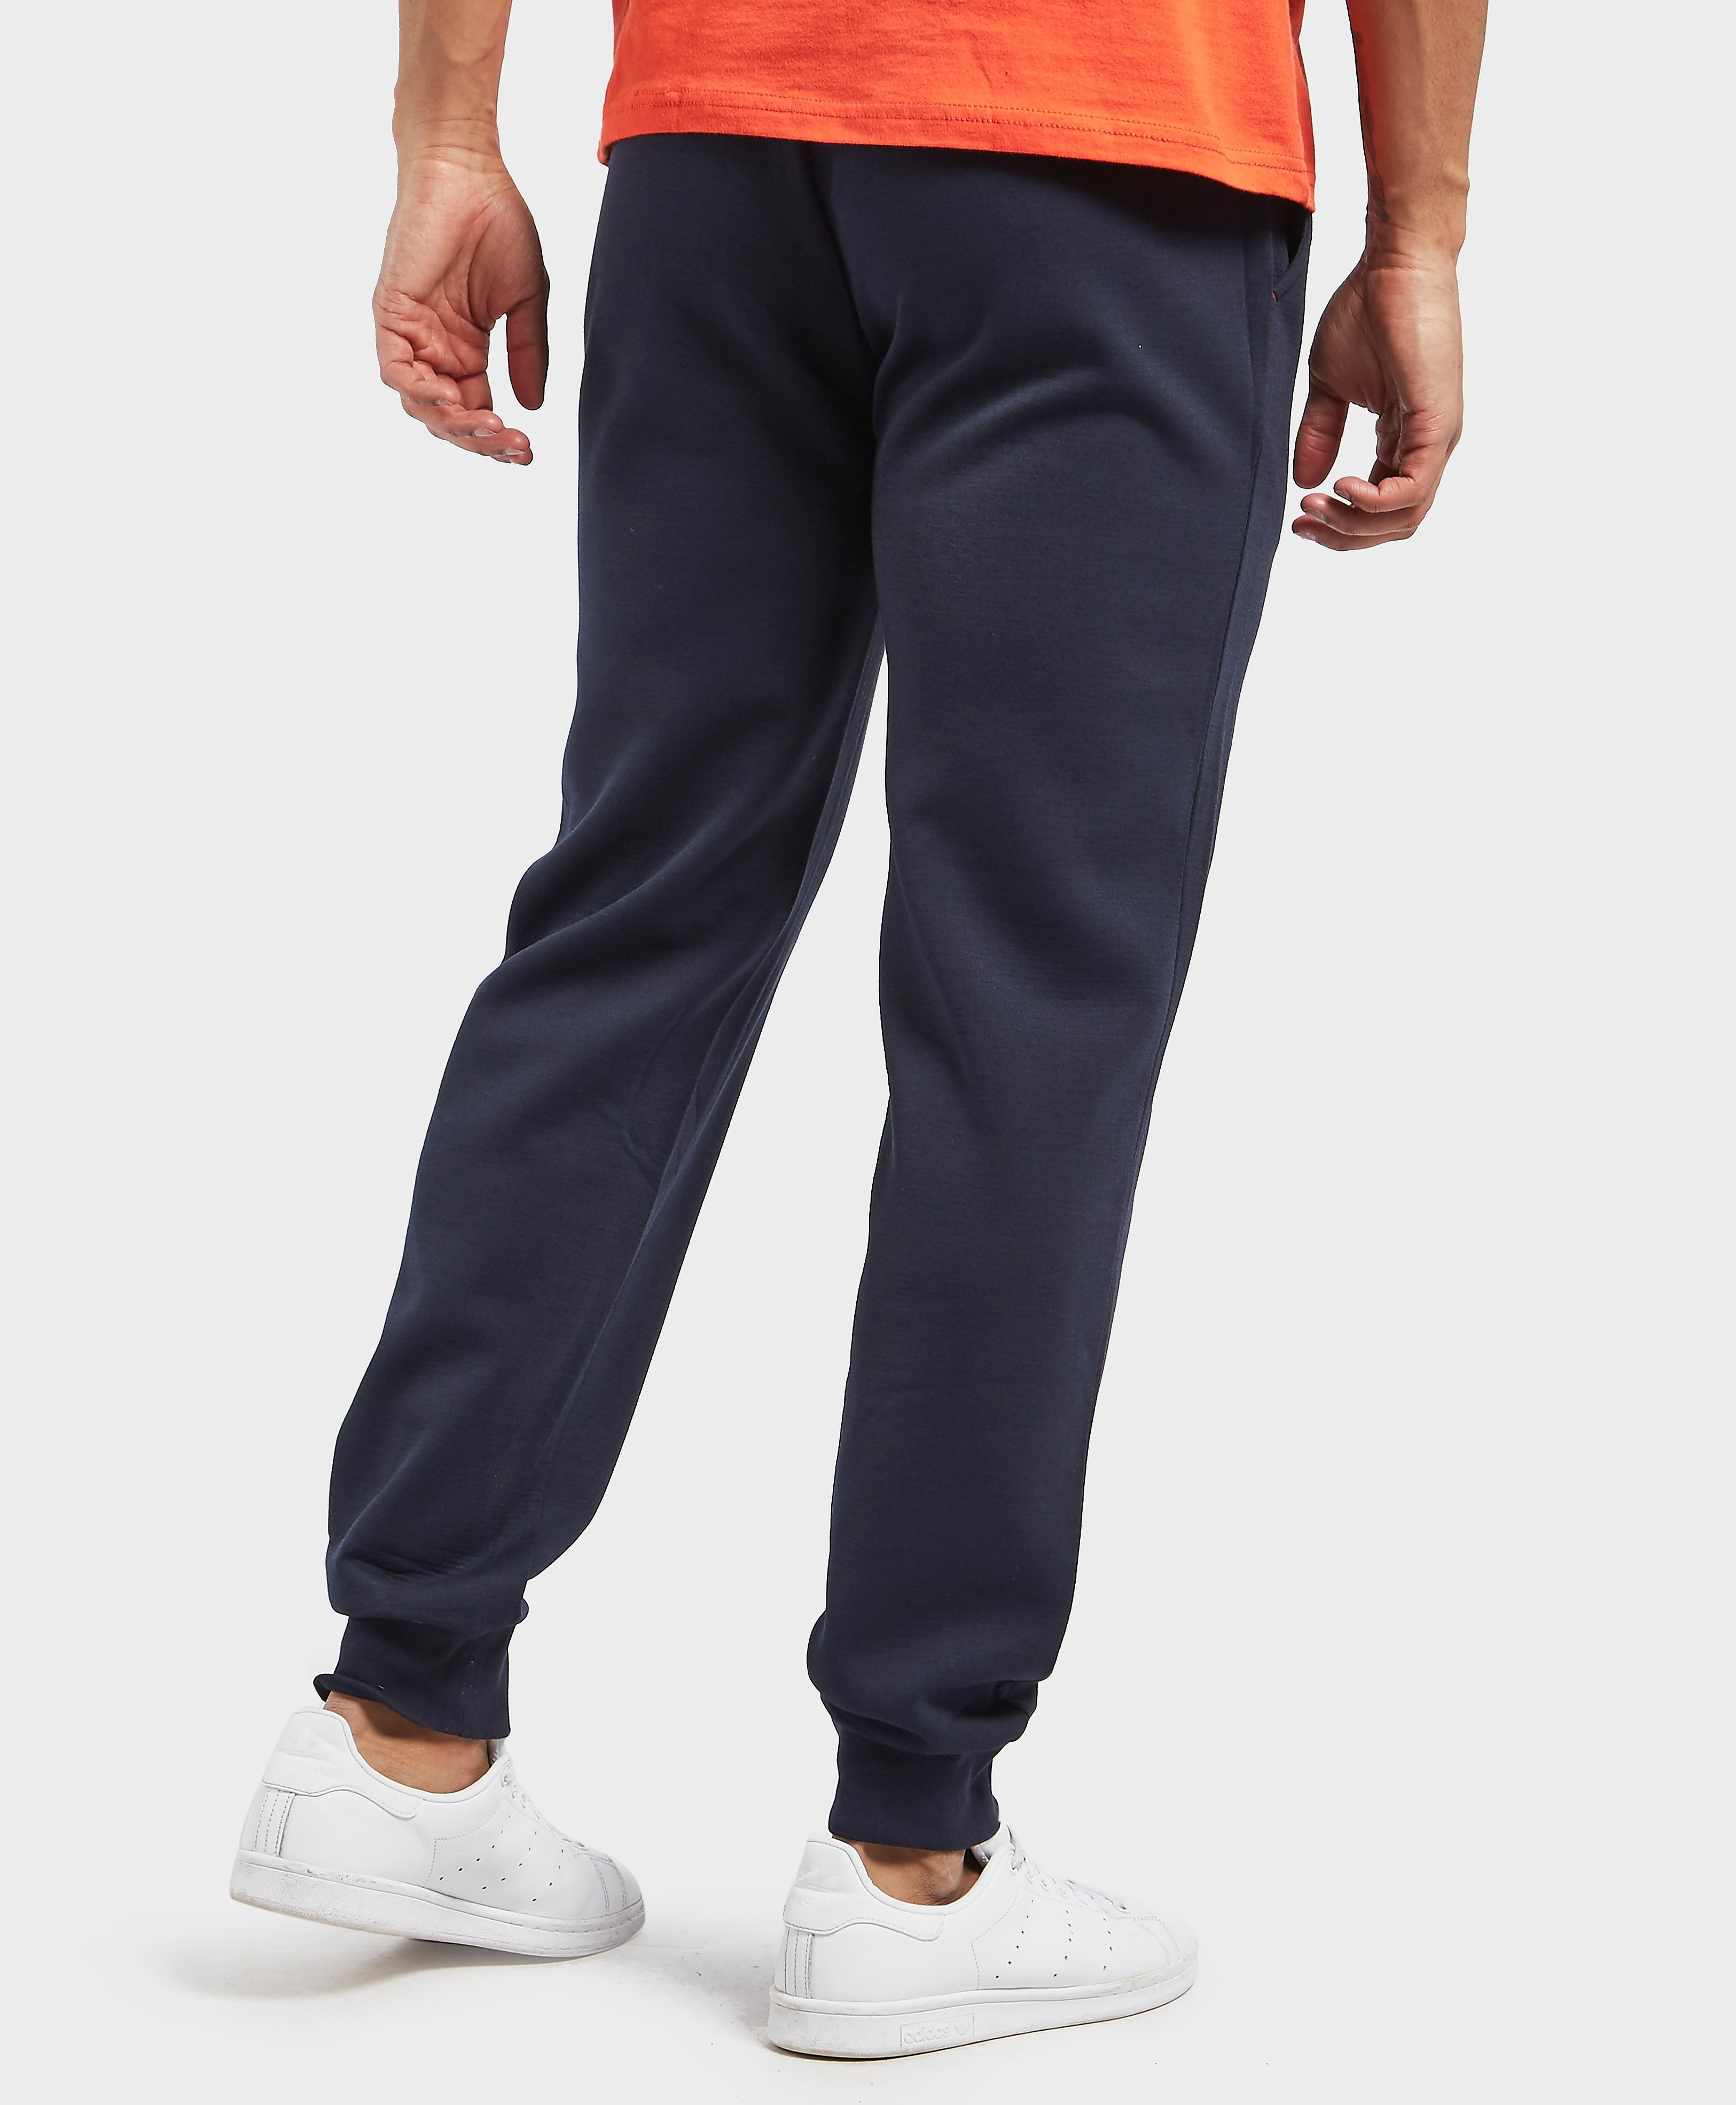 Tommy Hilfiger Large Leg Brand Track Pants